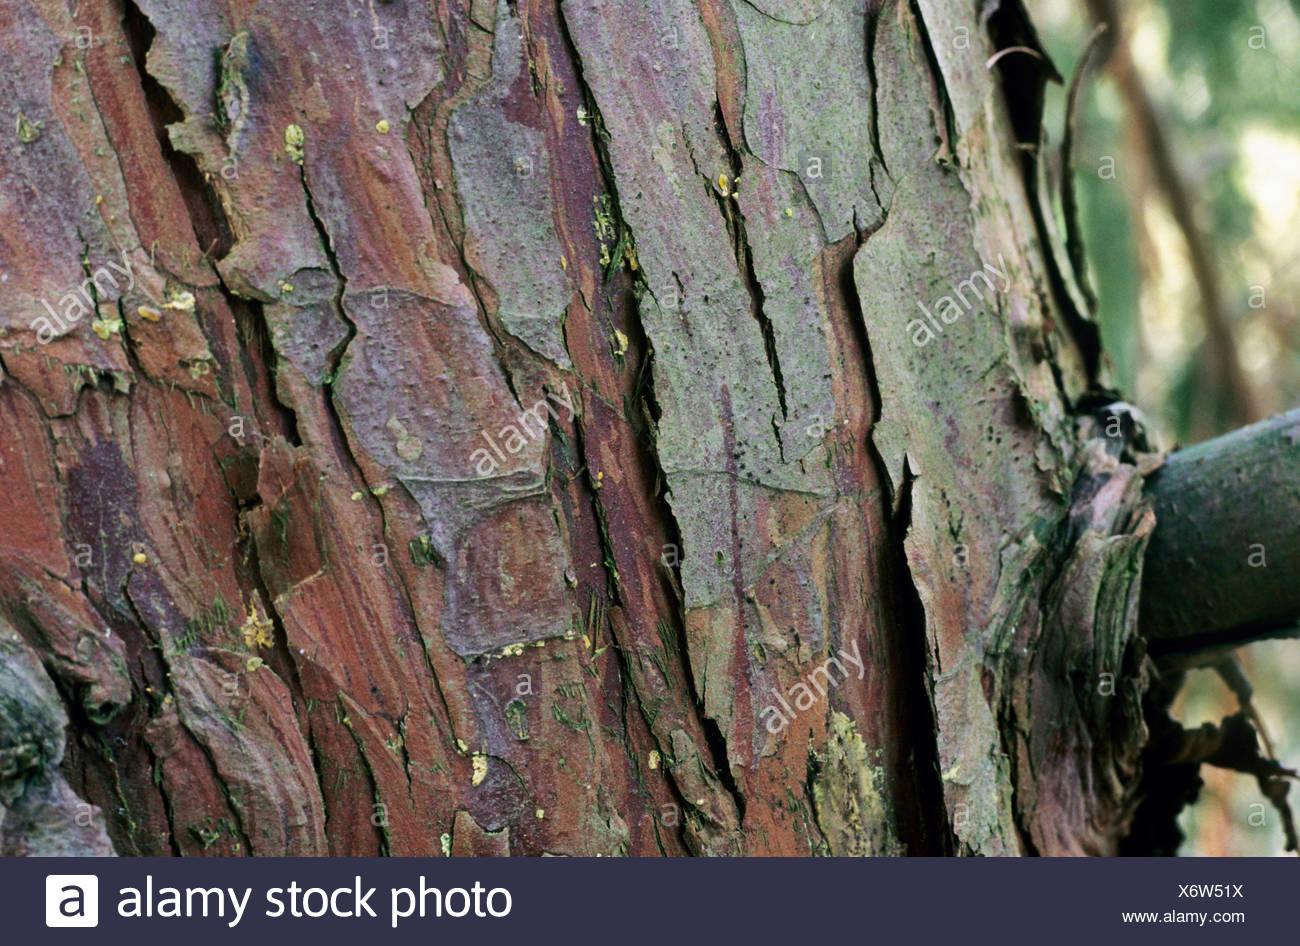 Des pleurs jaune (Cupressus nootkatensis 'Pendula', Cupressus nootkatensis Pendula, Chamaecyparis nootkatensis 'Pendula', Chamaecyparis nootkatensis pendula), l'écorce Photo Stock